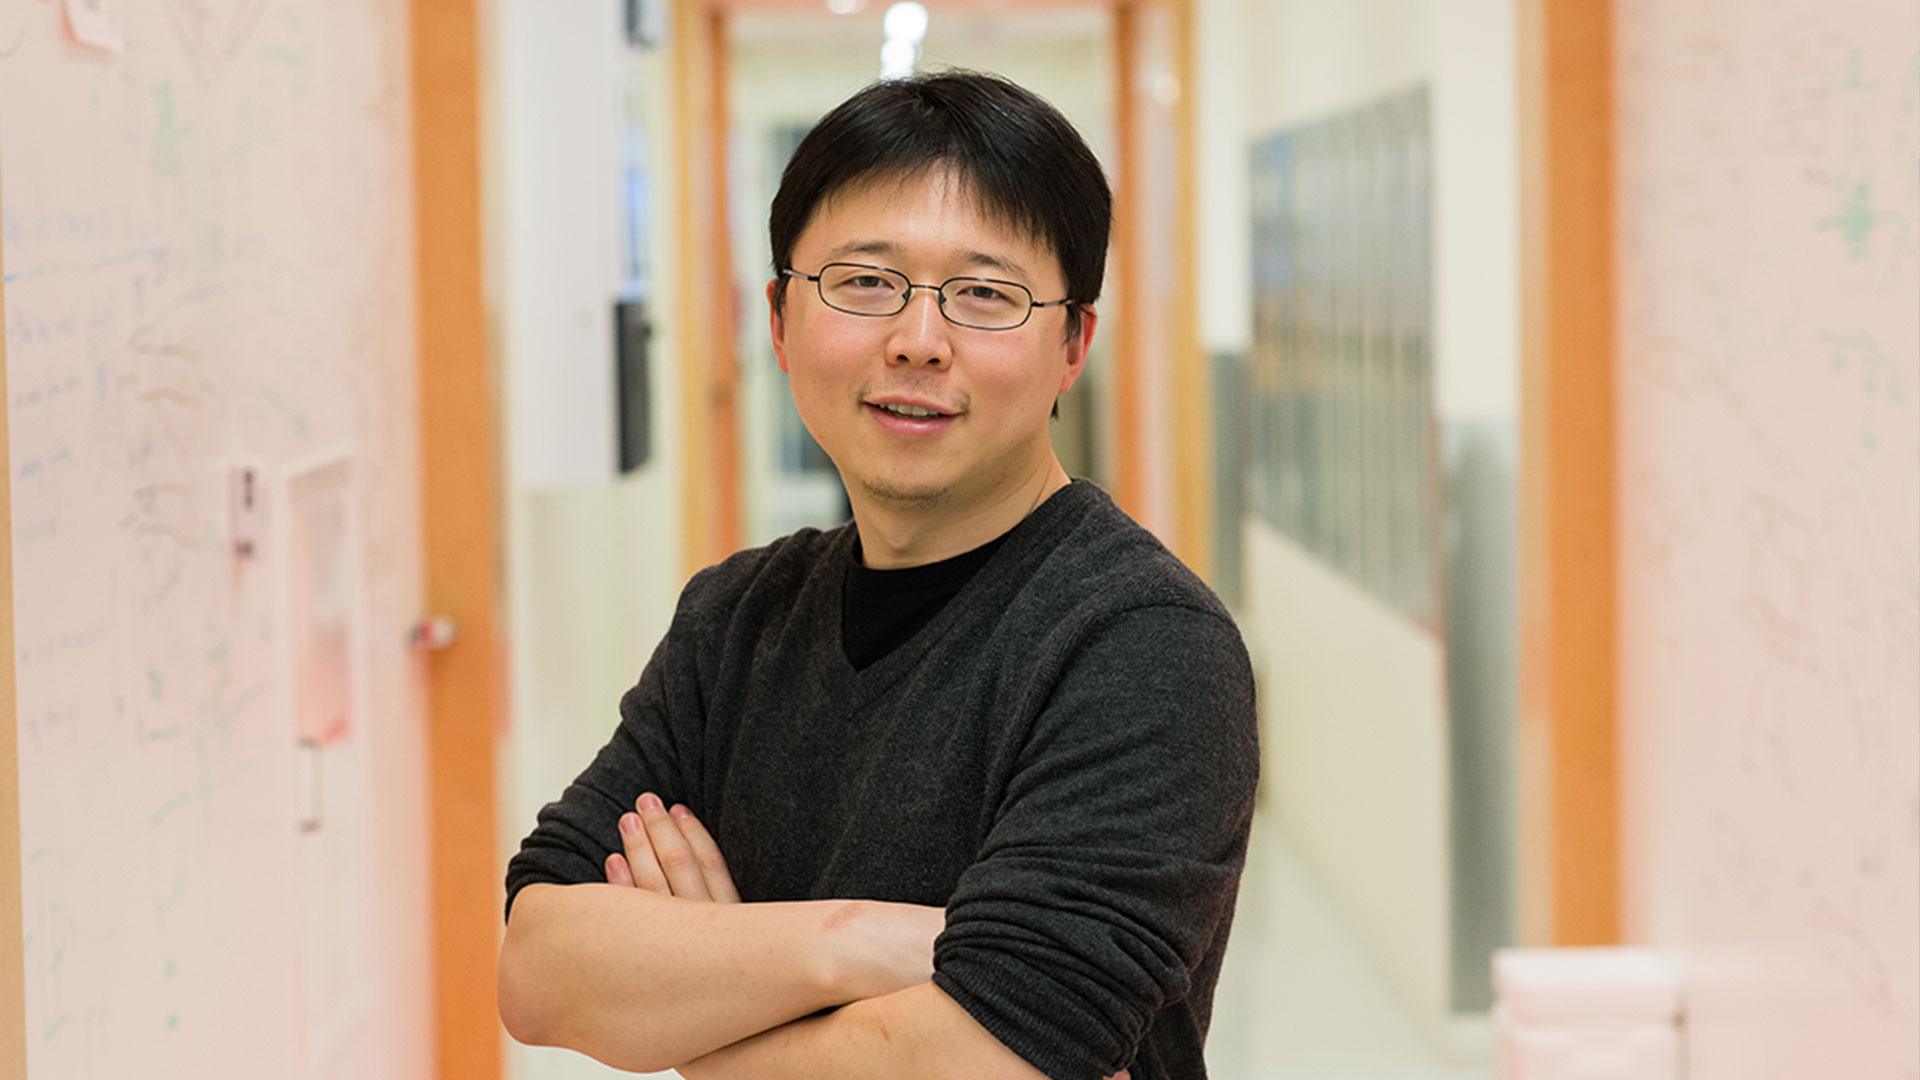 Feng Zhang portrait